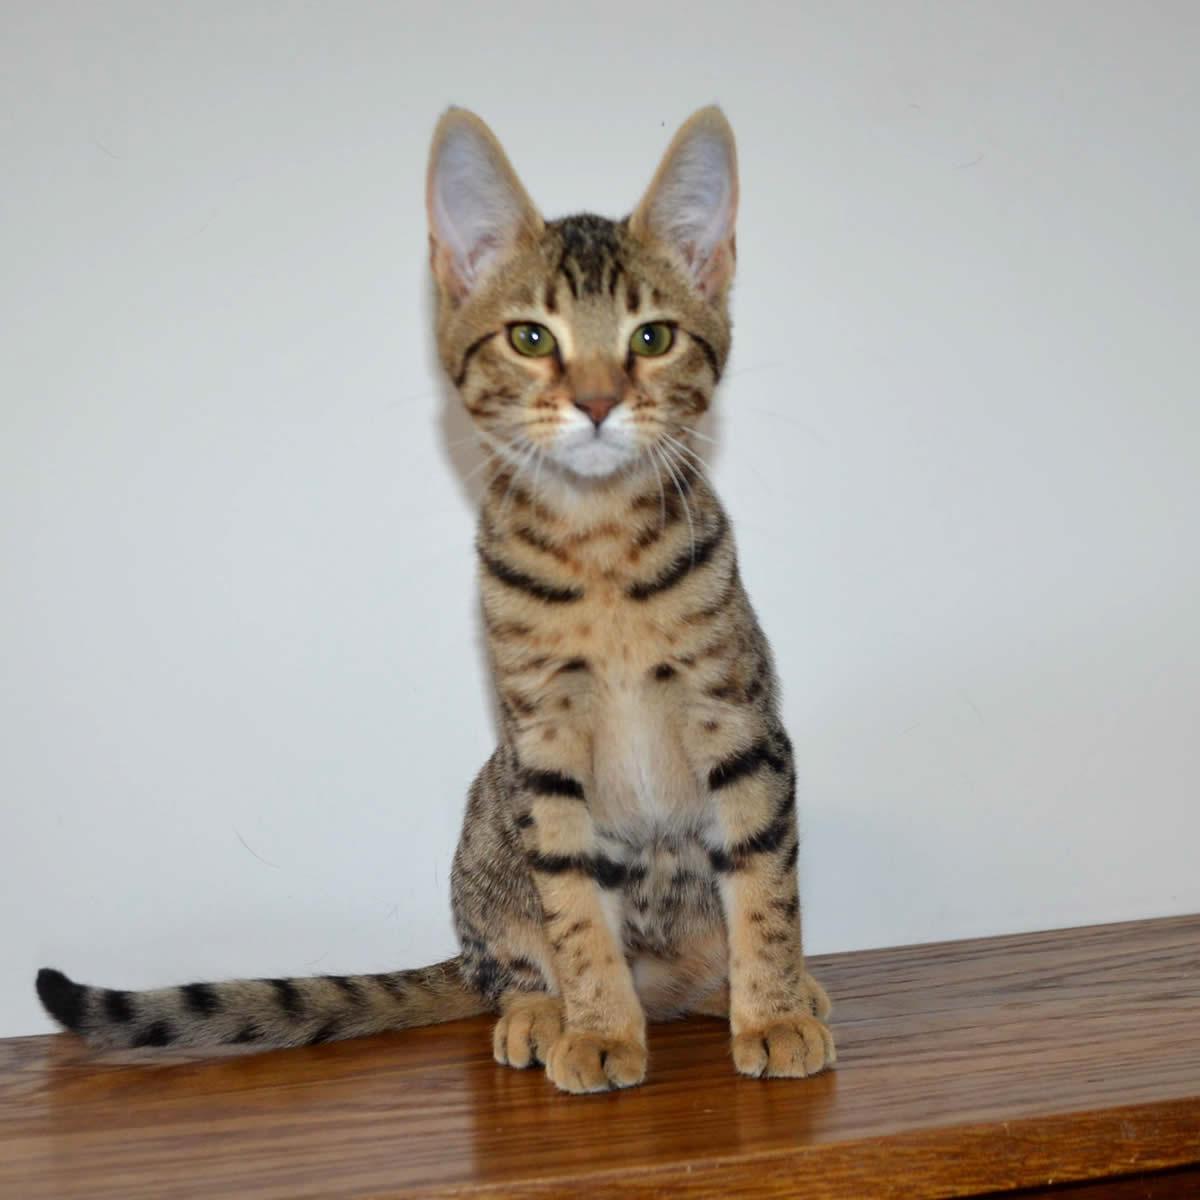 Savannah Cats and Bengal Cats Make Bad Pets | Big Cat Rescue